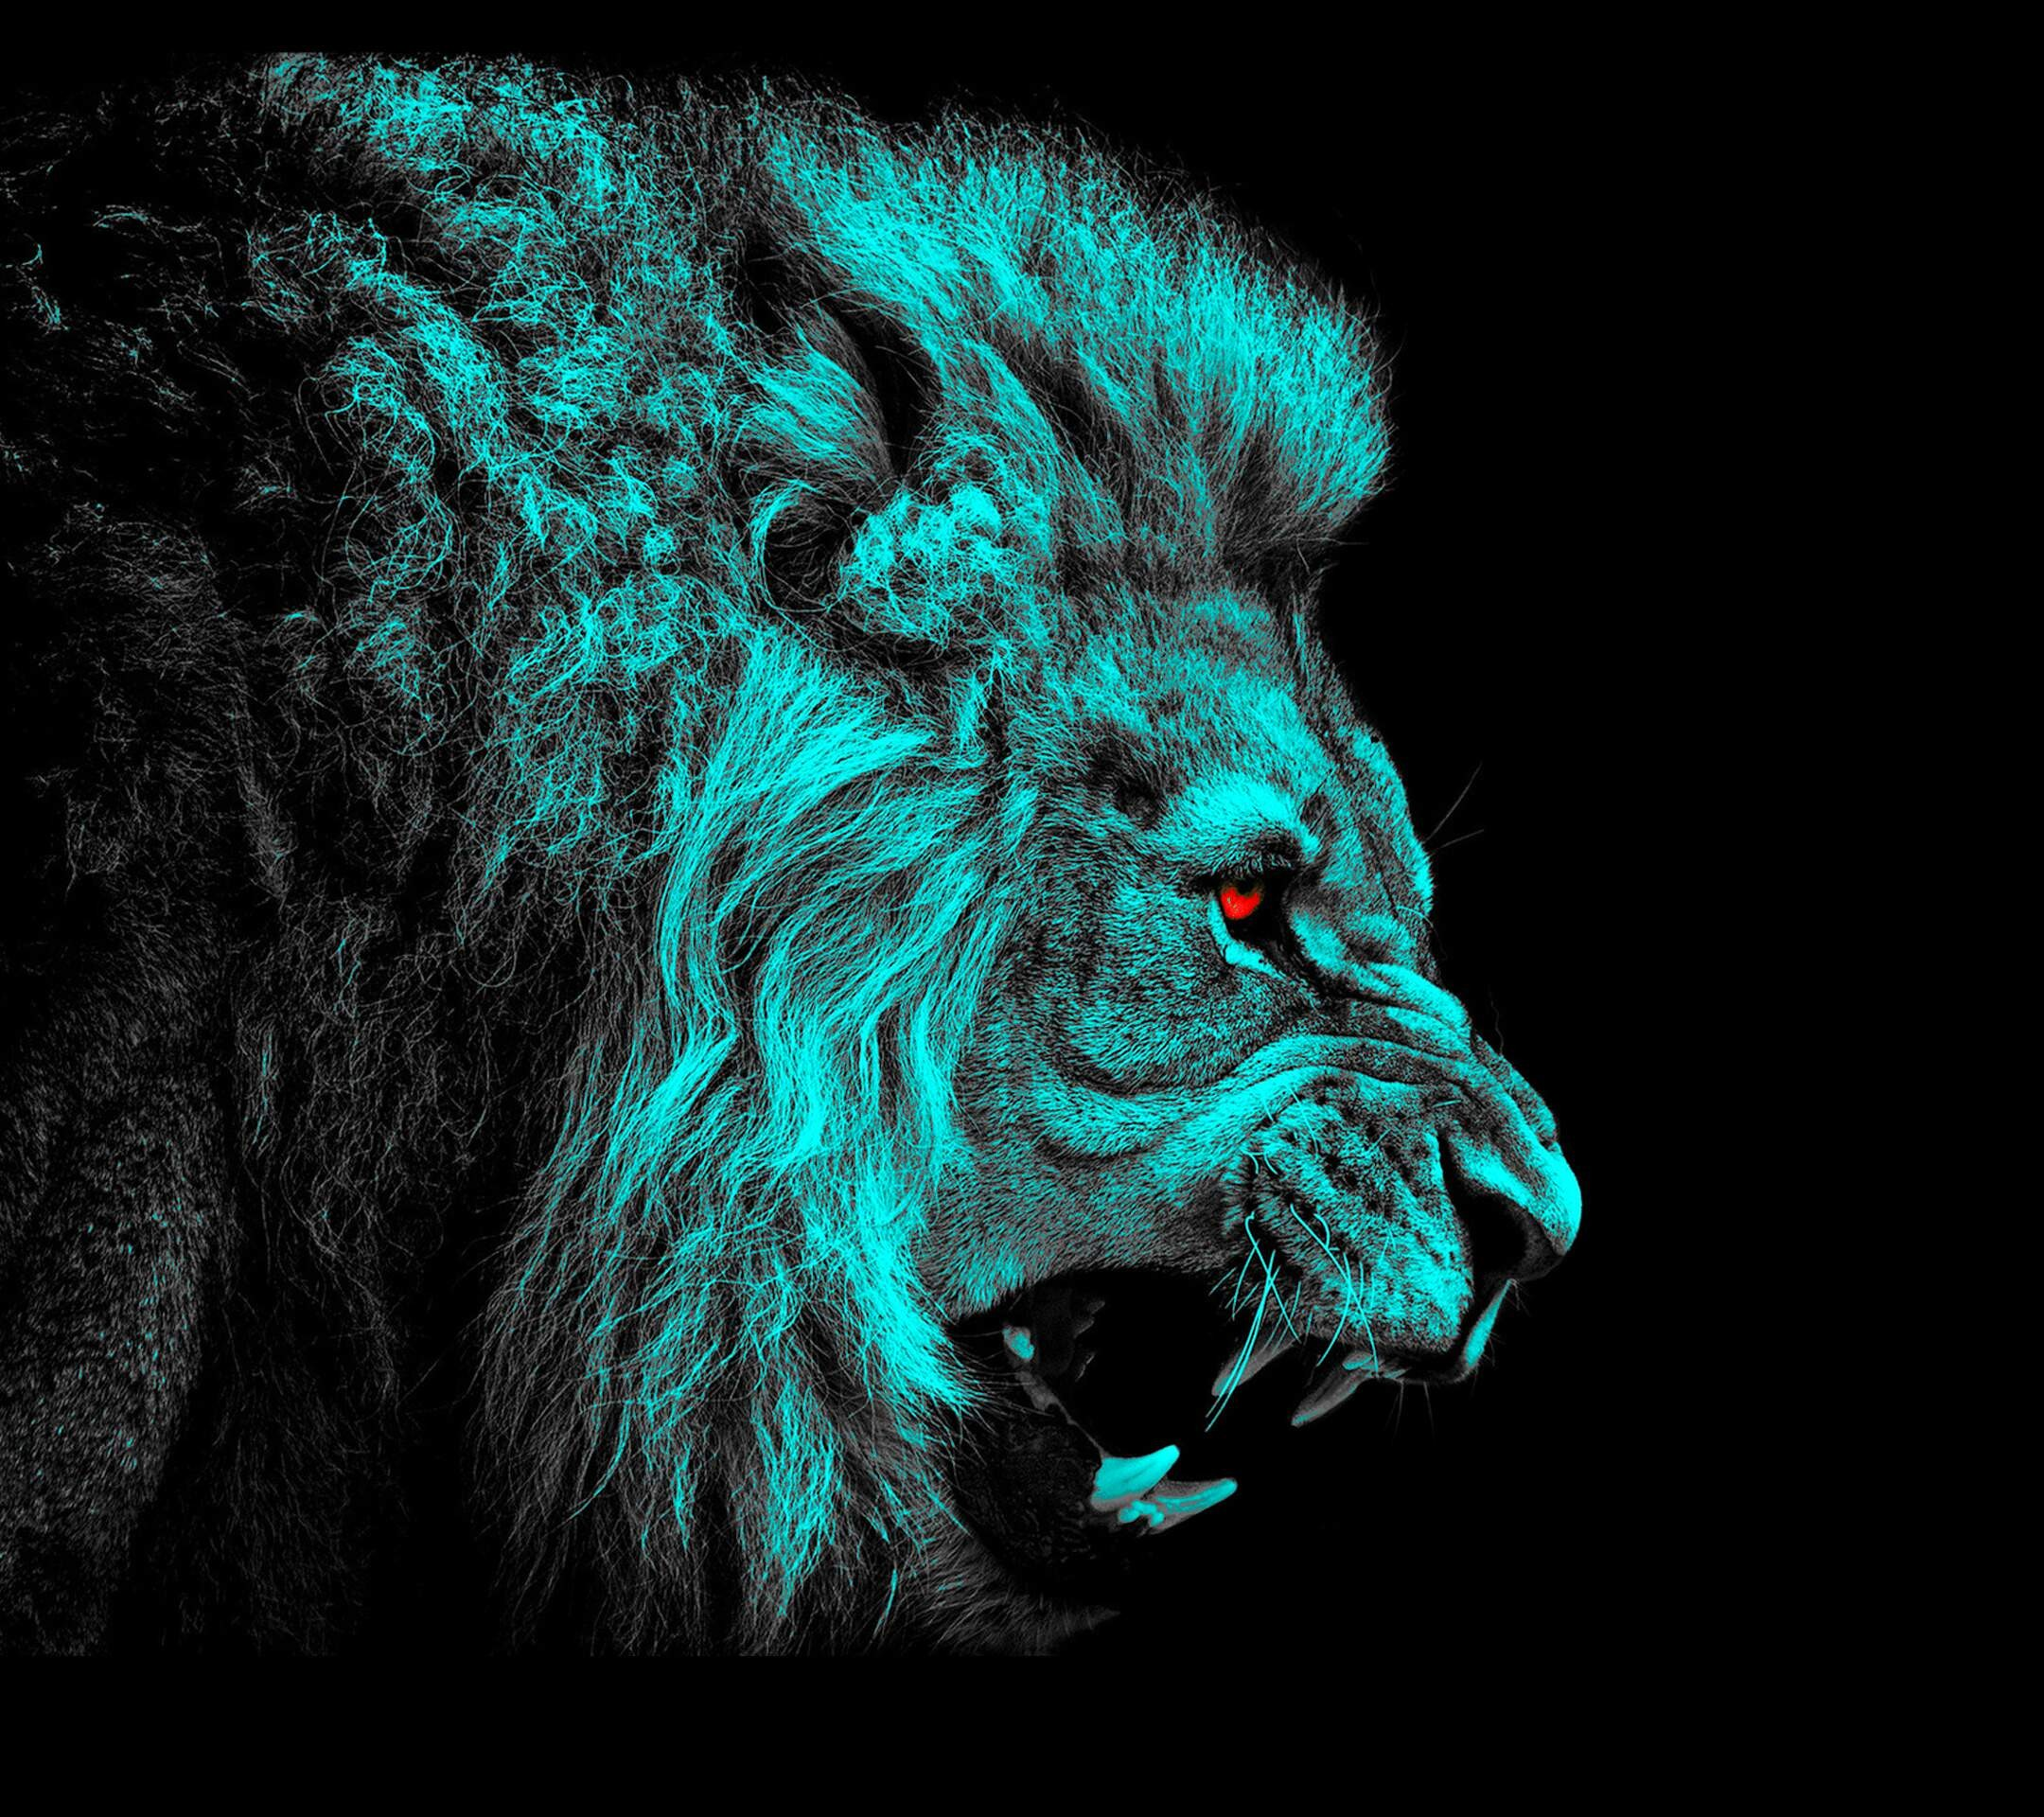 Lion wallpaper ·① Download free beautiful full HD ...